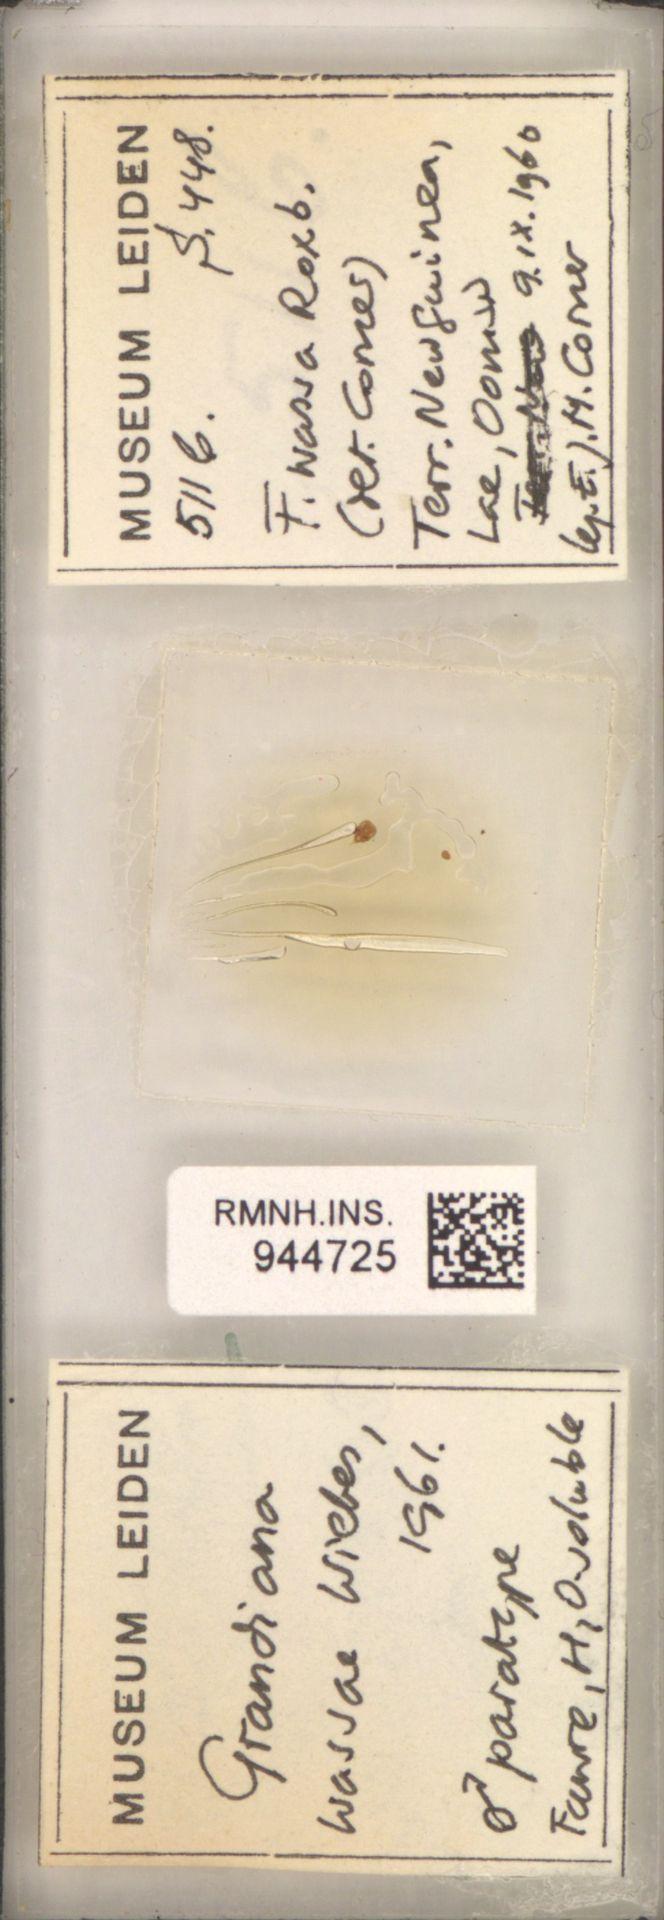 RMNH.INS.944725 | Grandiana wassae Wiebes, 1961